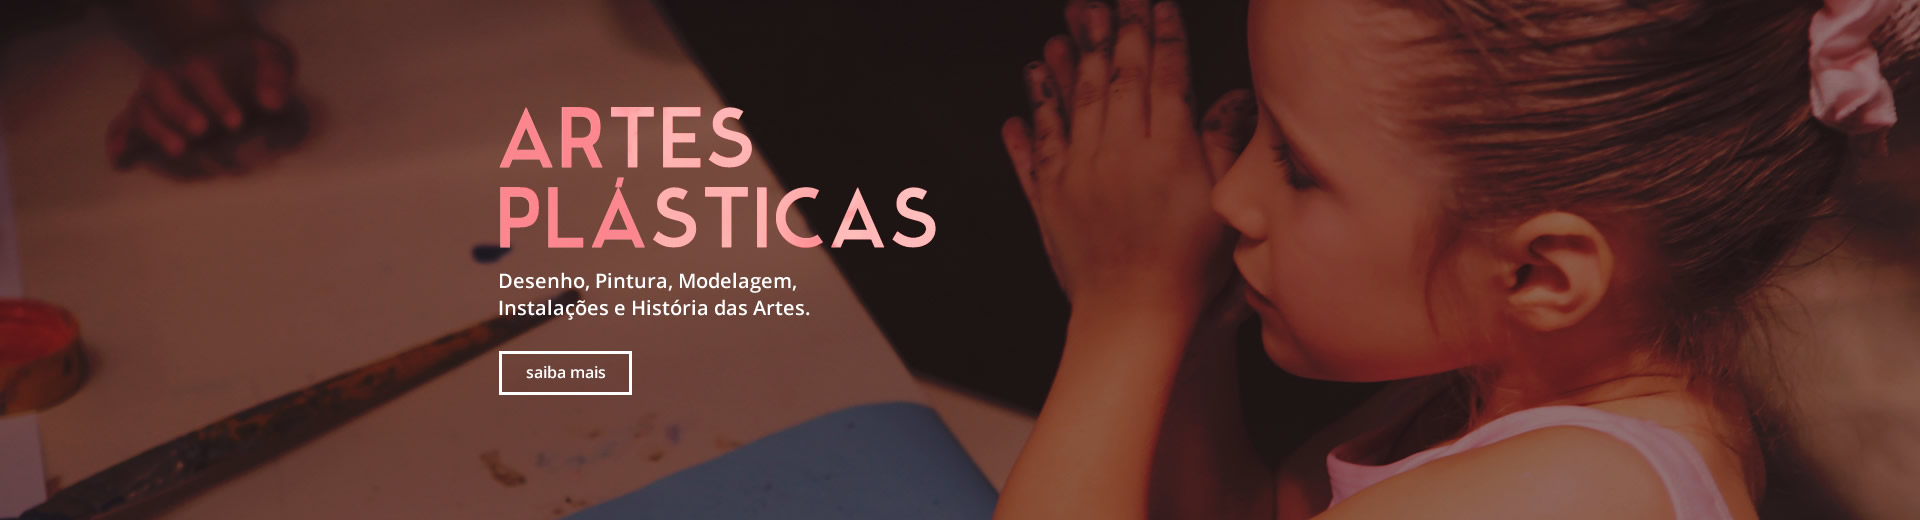 slide-artesplasticas-14121679-10546.jpg